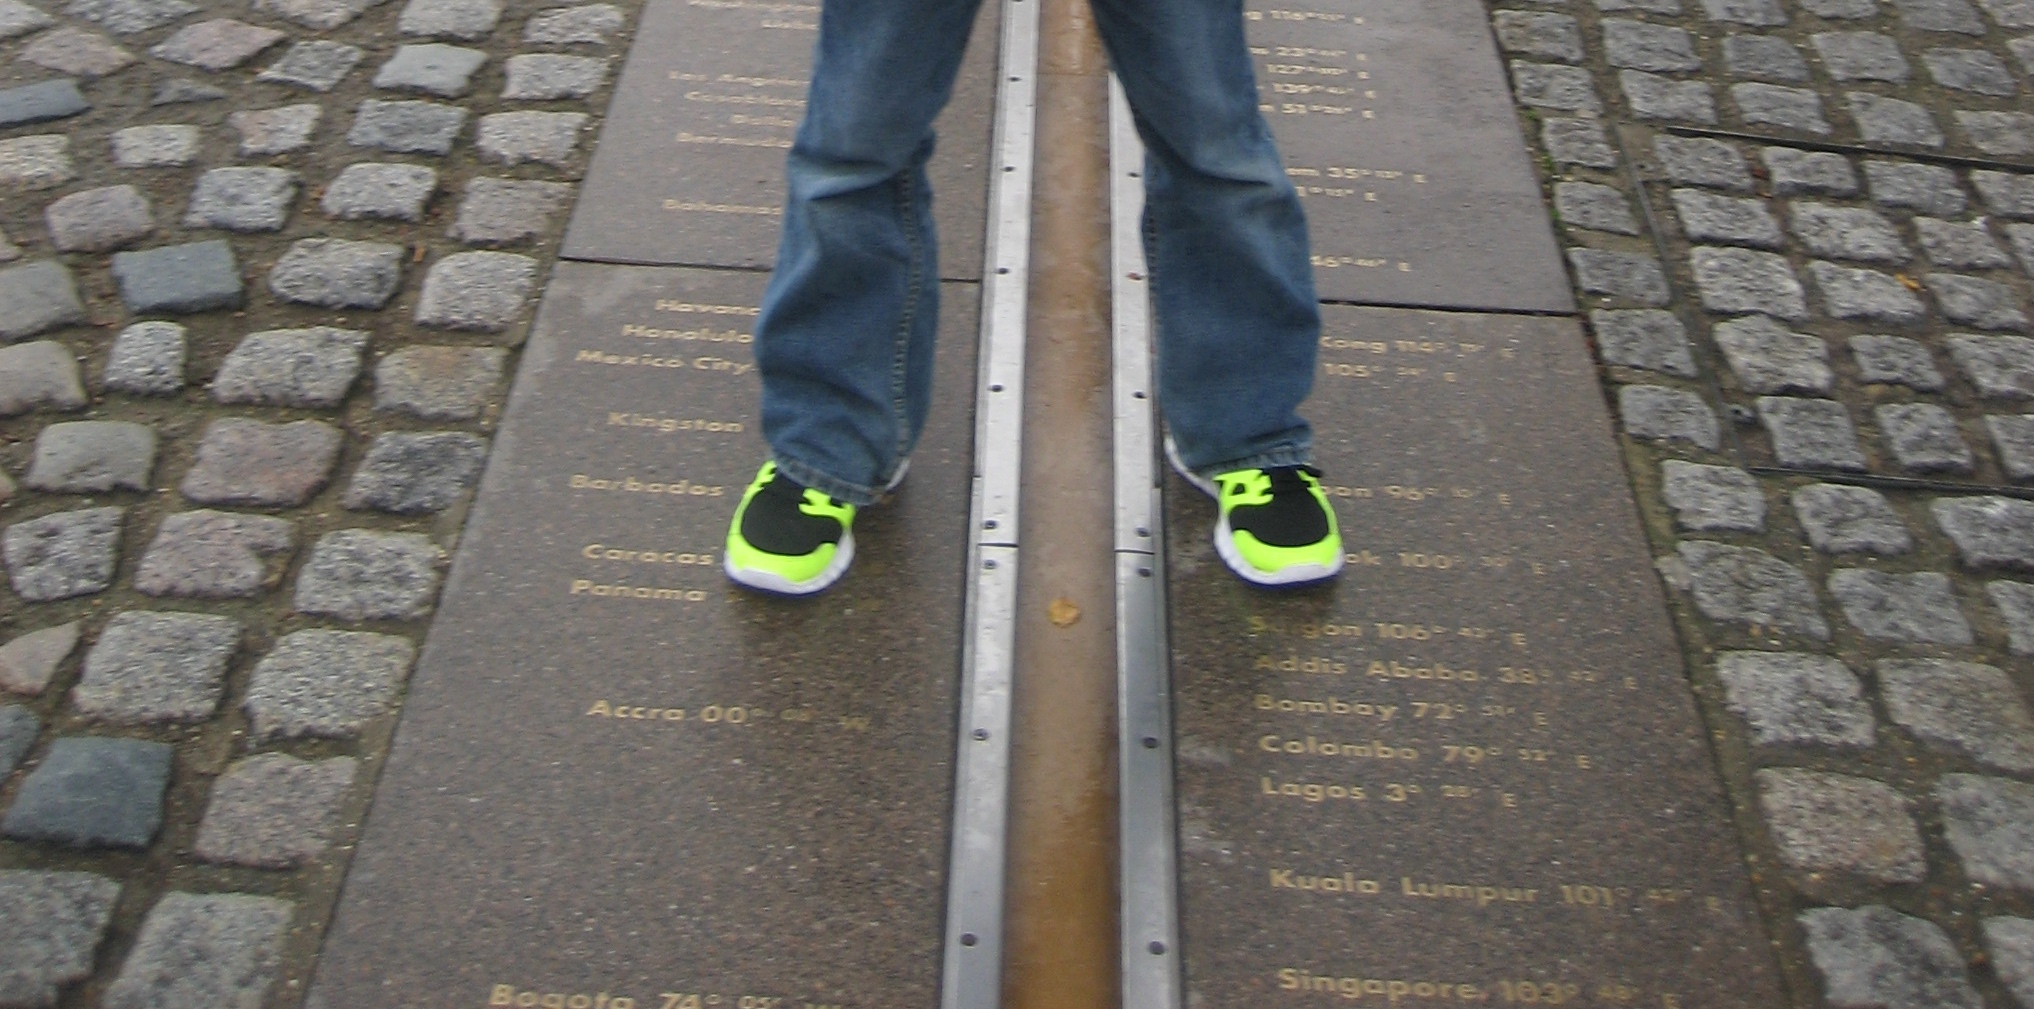 Null-Meridian in Greenwich.